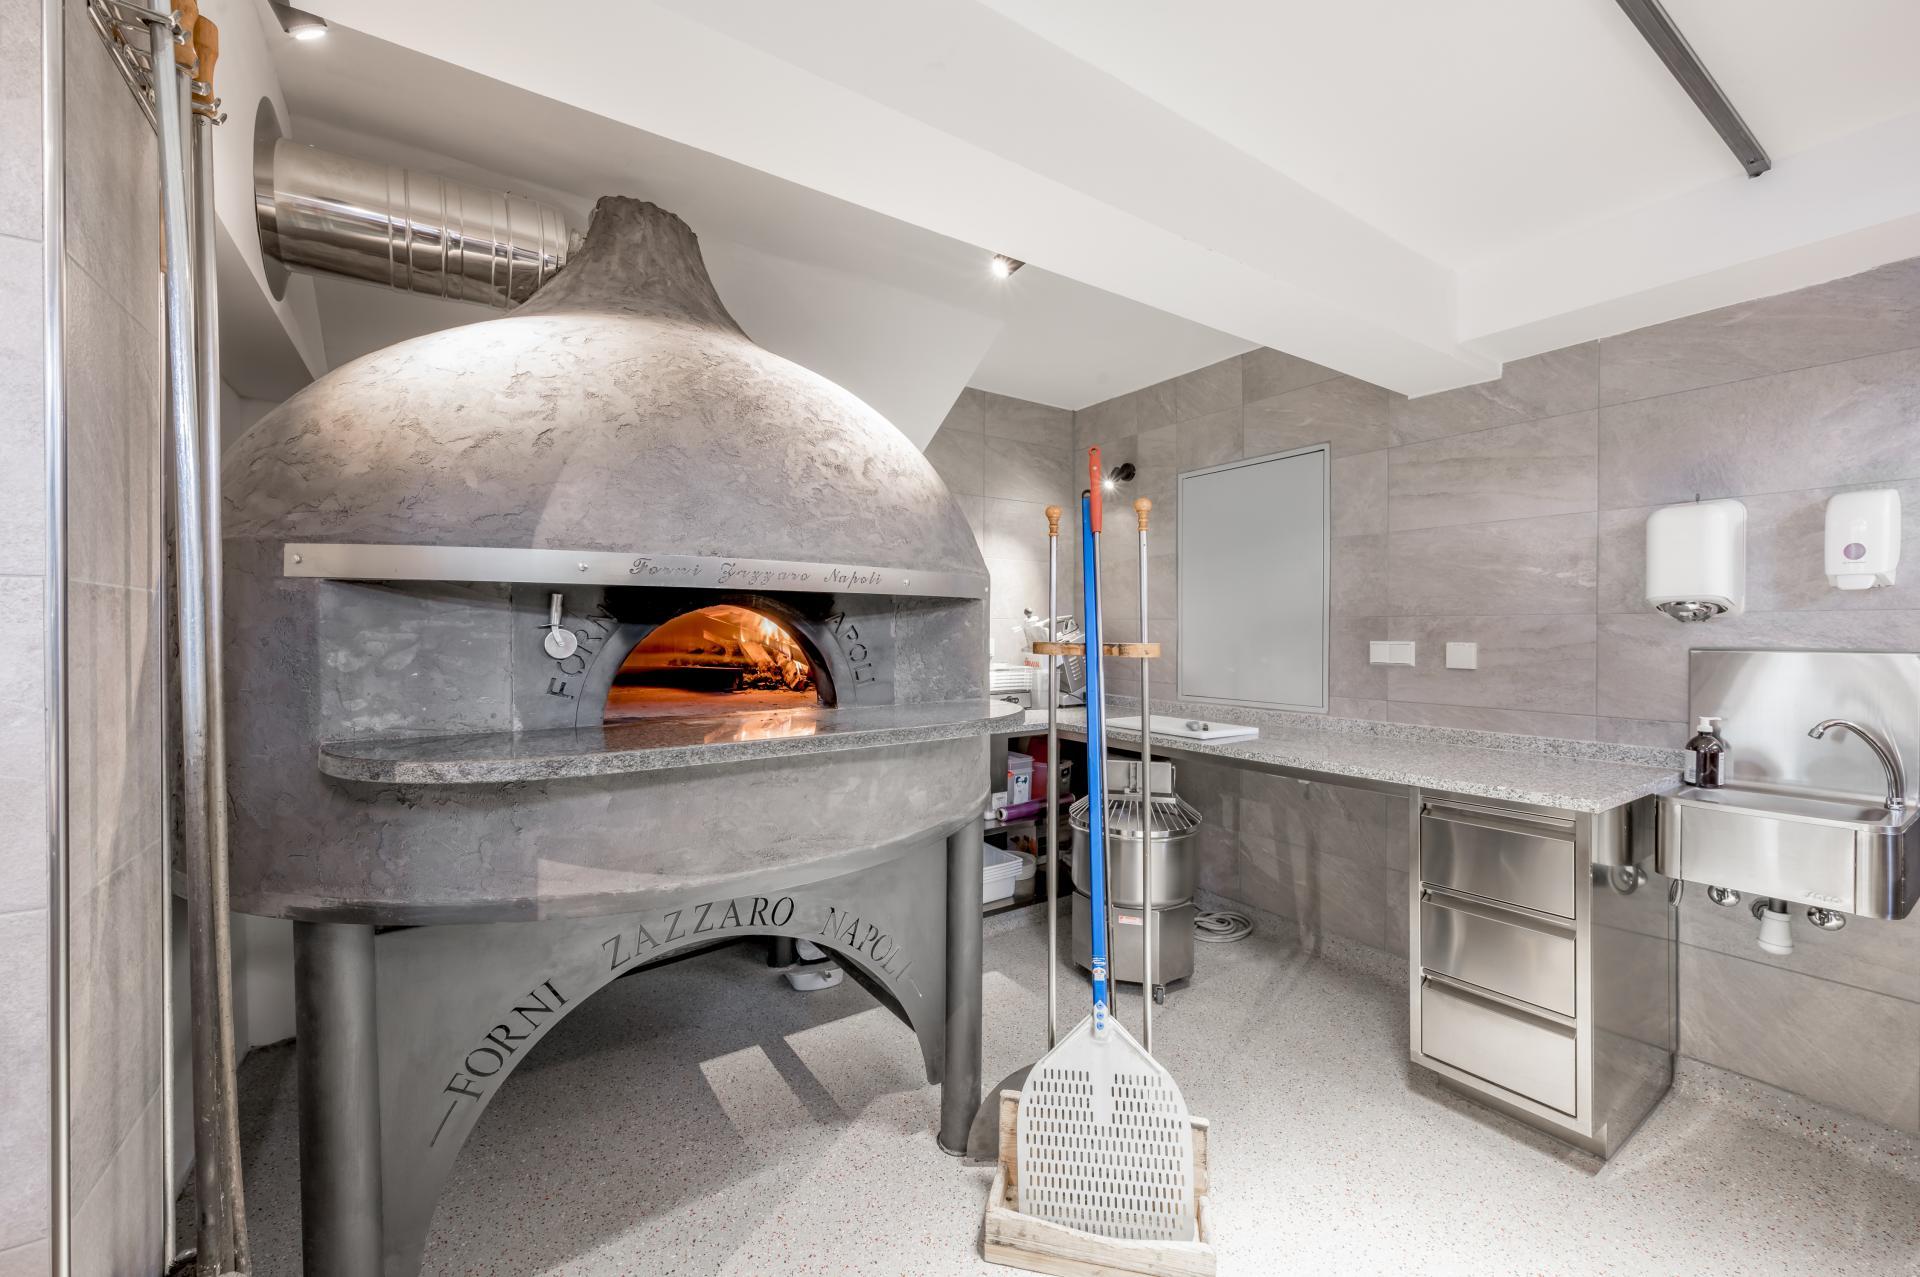 Restaurant-Appartements #Restaurant#Gelateria - Prendi Pizza#Bildergalerie